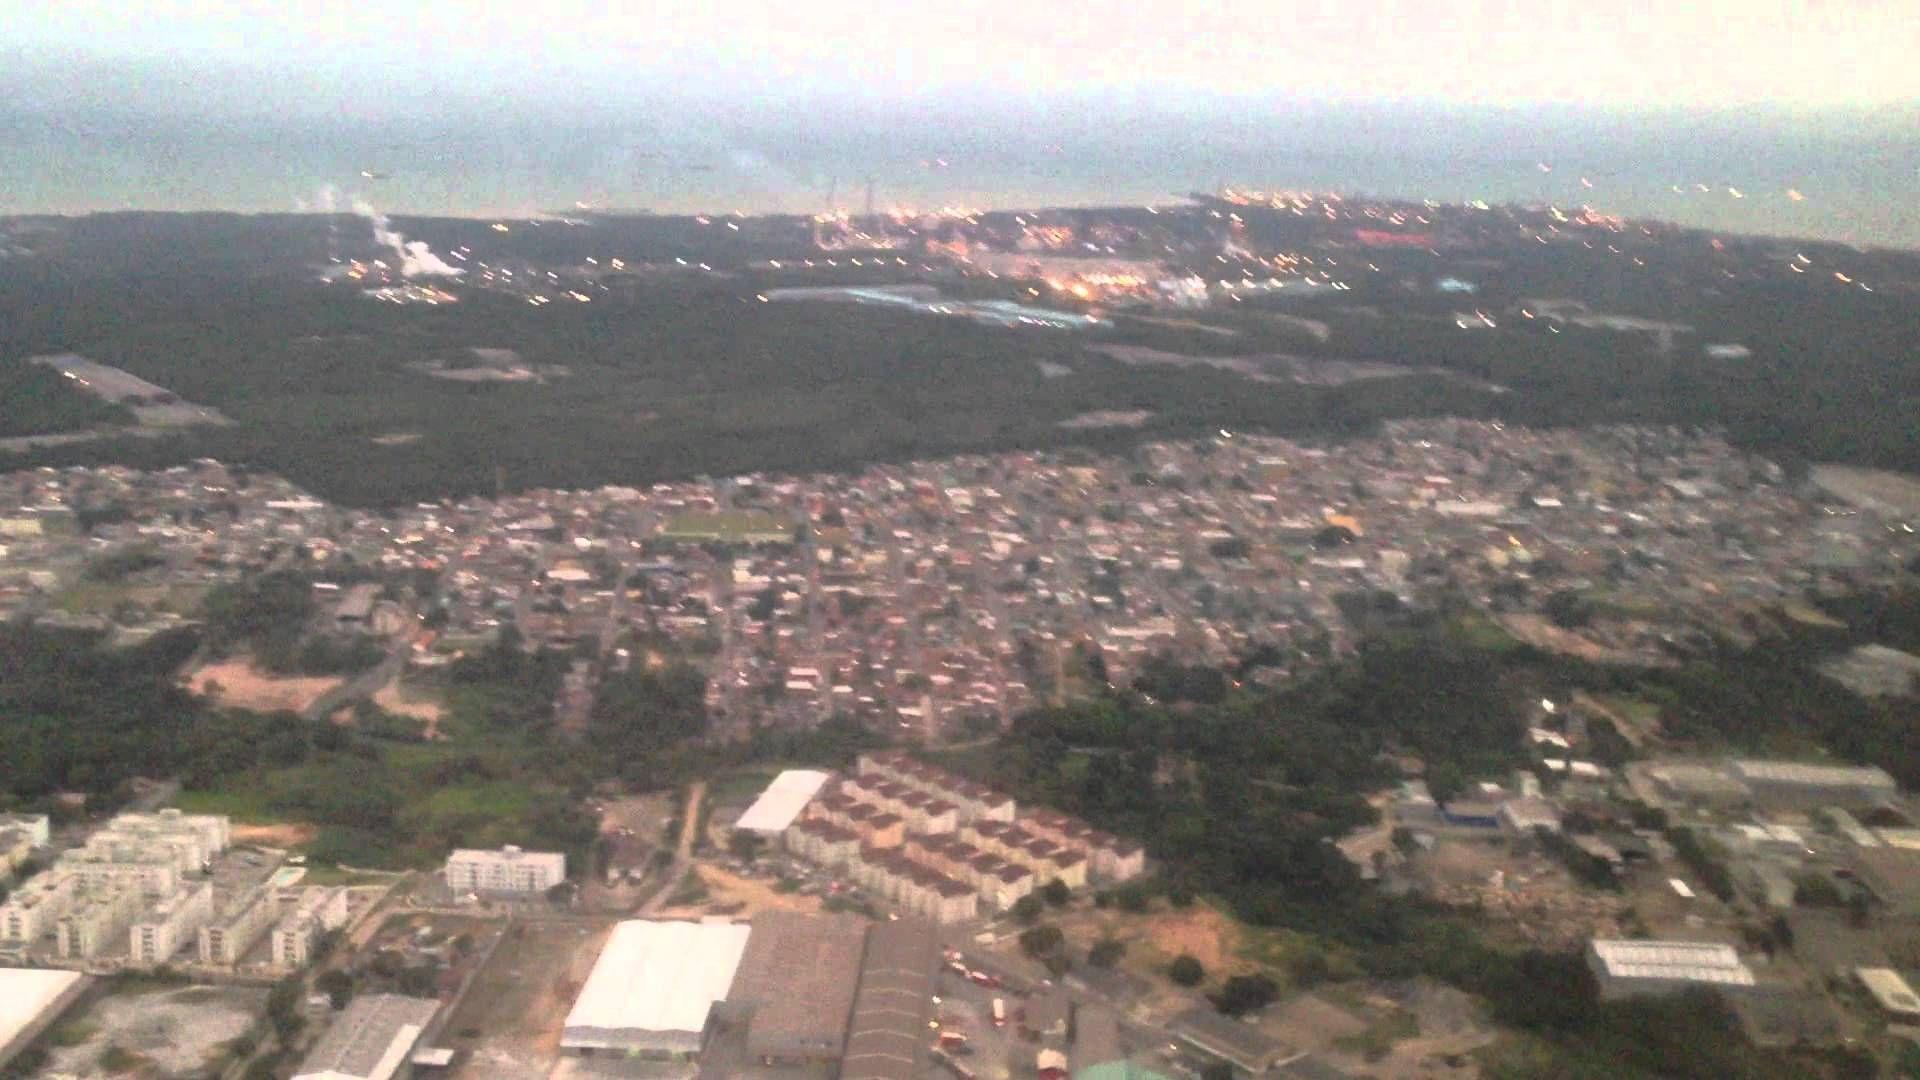 Aeroporto Vix : Aterrissagem pouso gol boeing aeroporto de vitória es vix